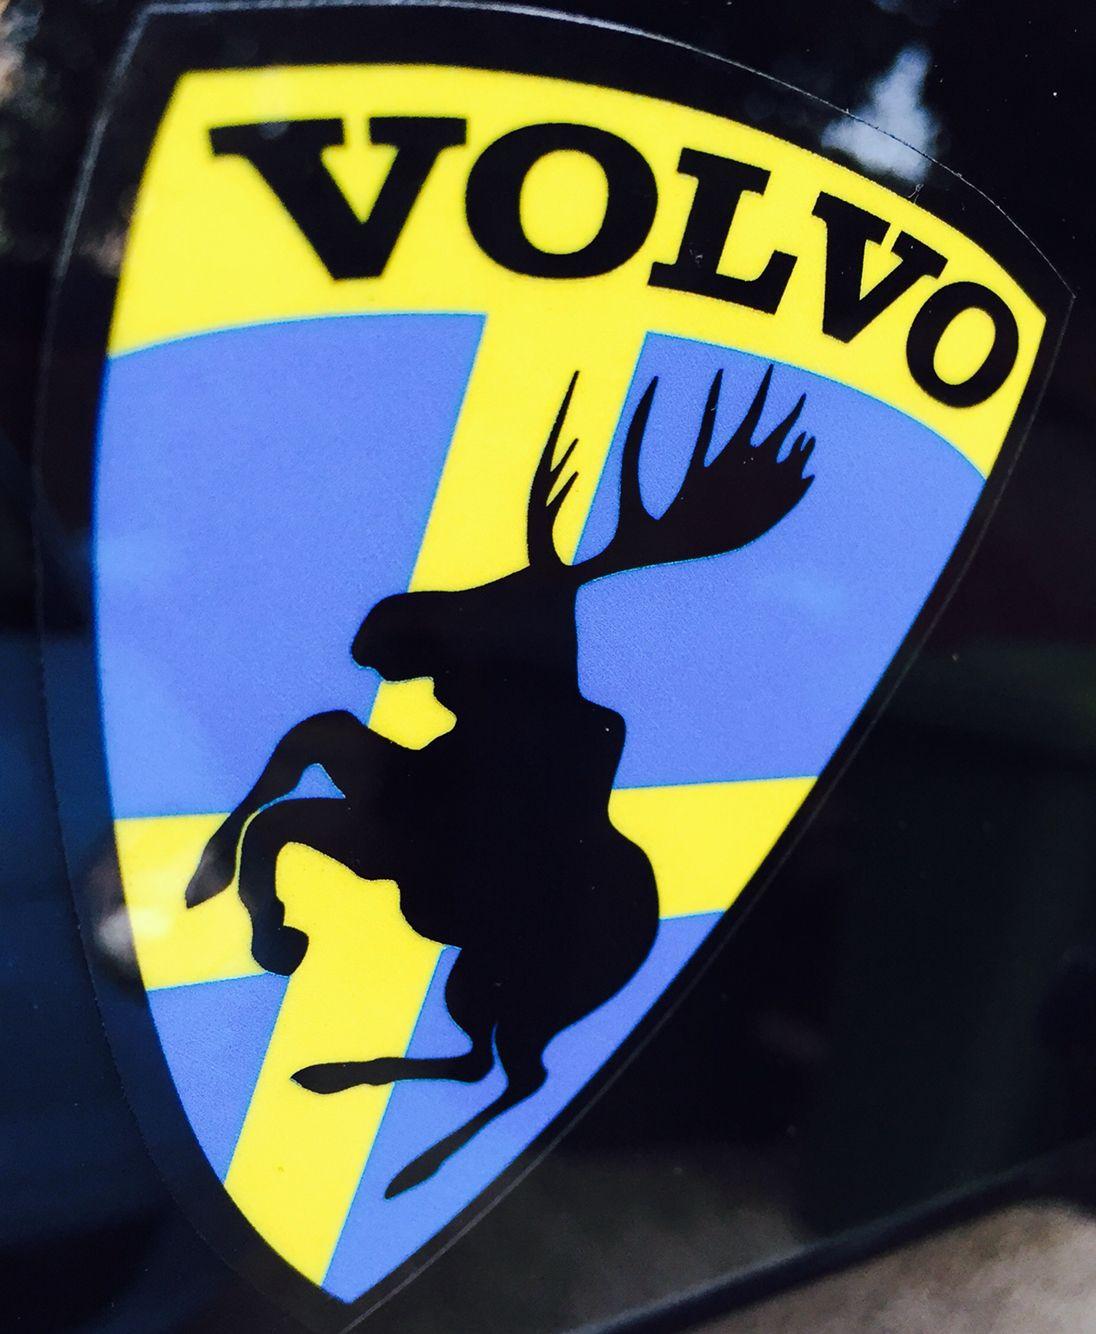 Volvo 850 volvo amazon ferrari logo emoji